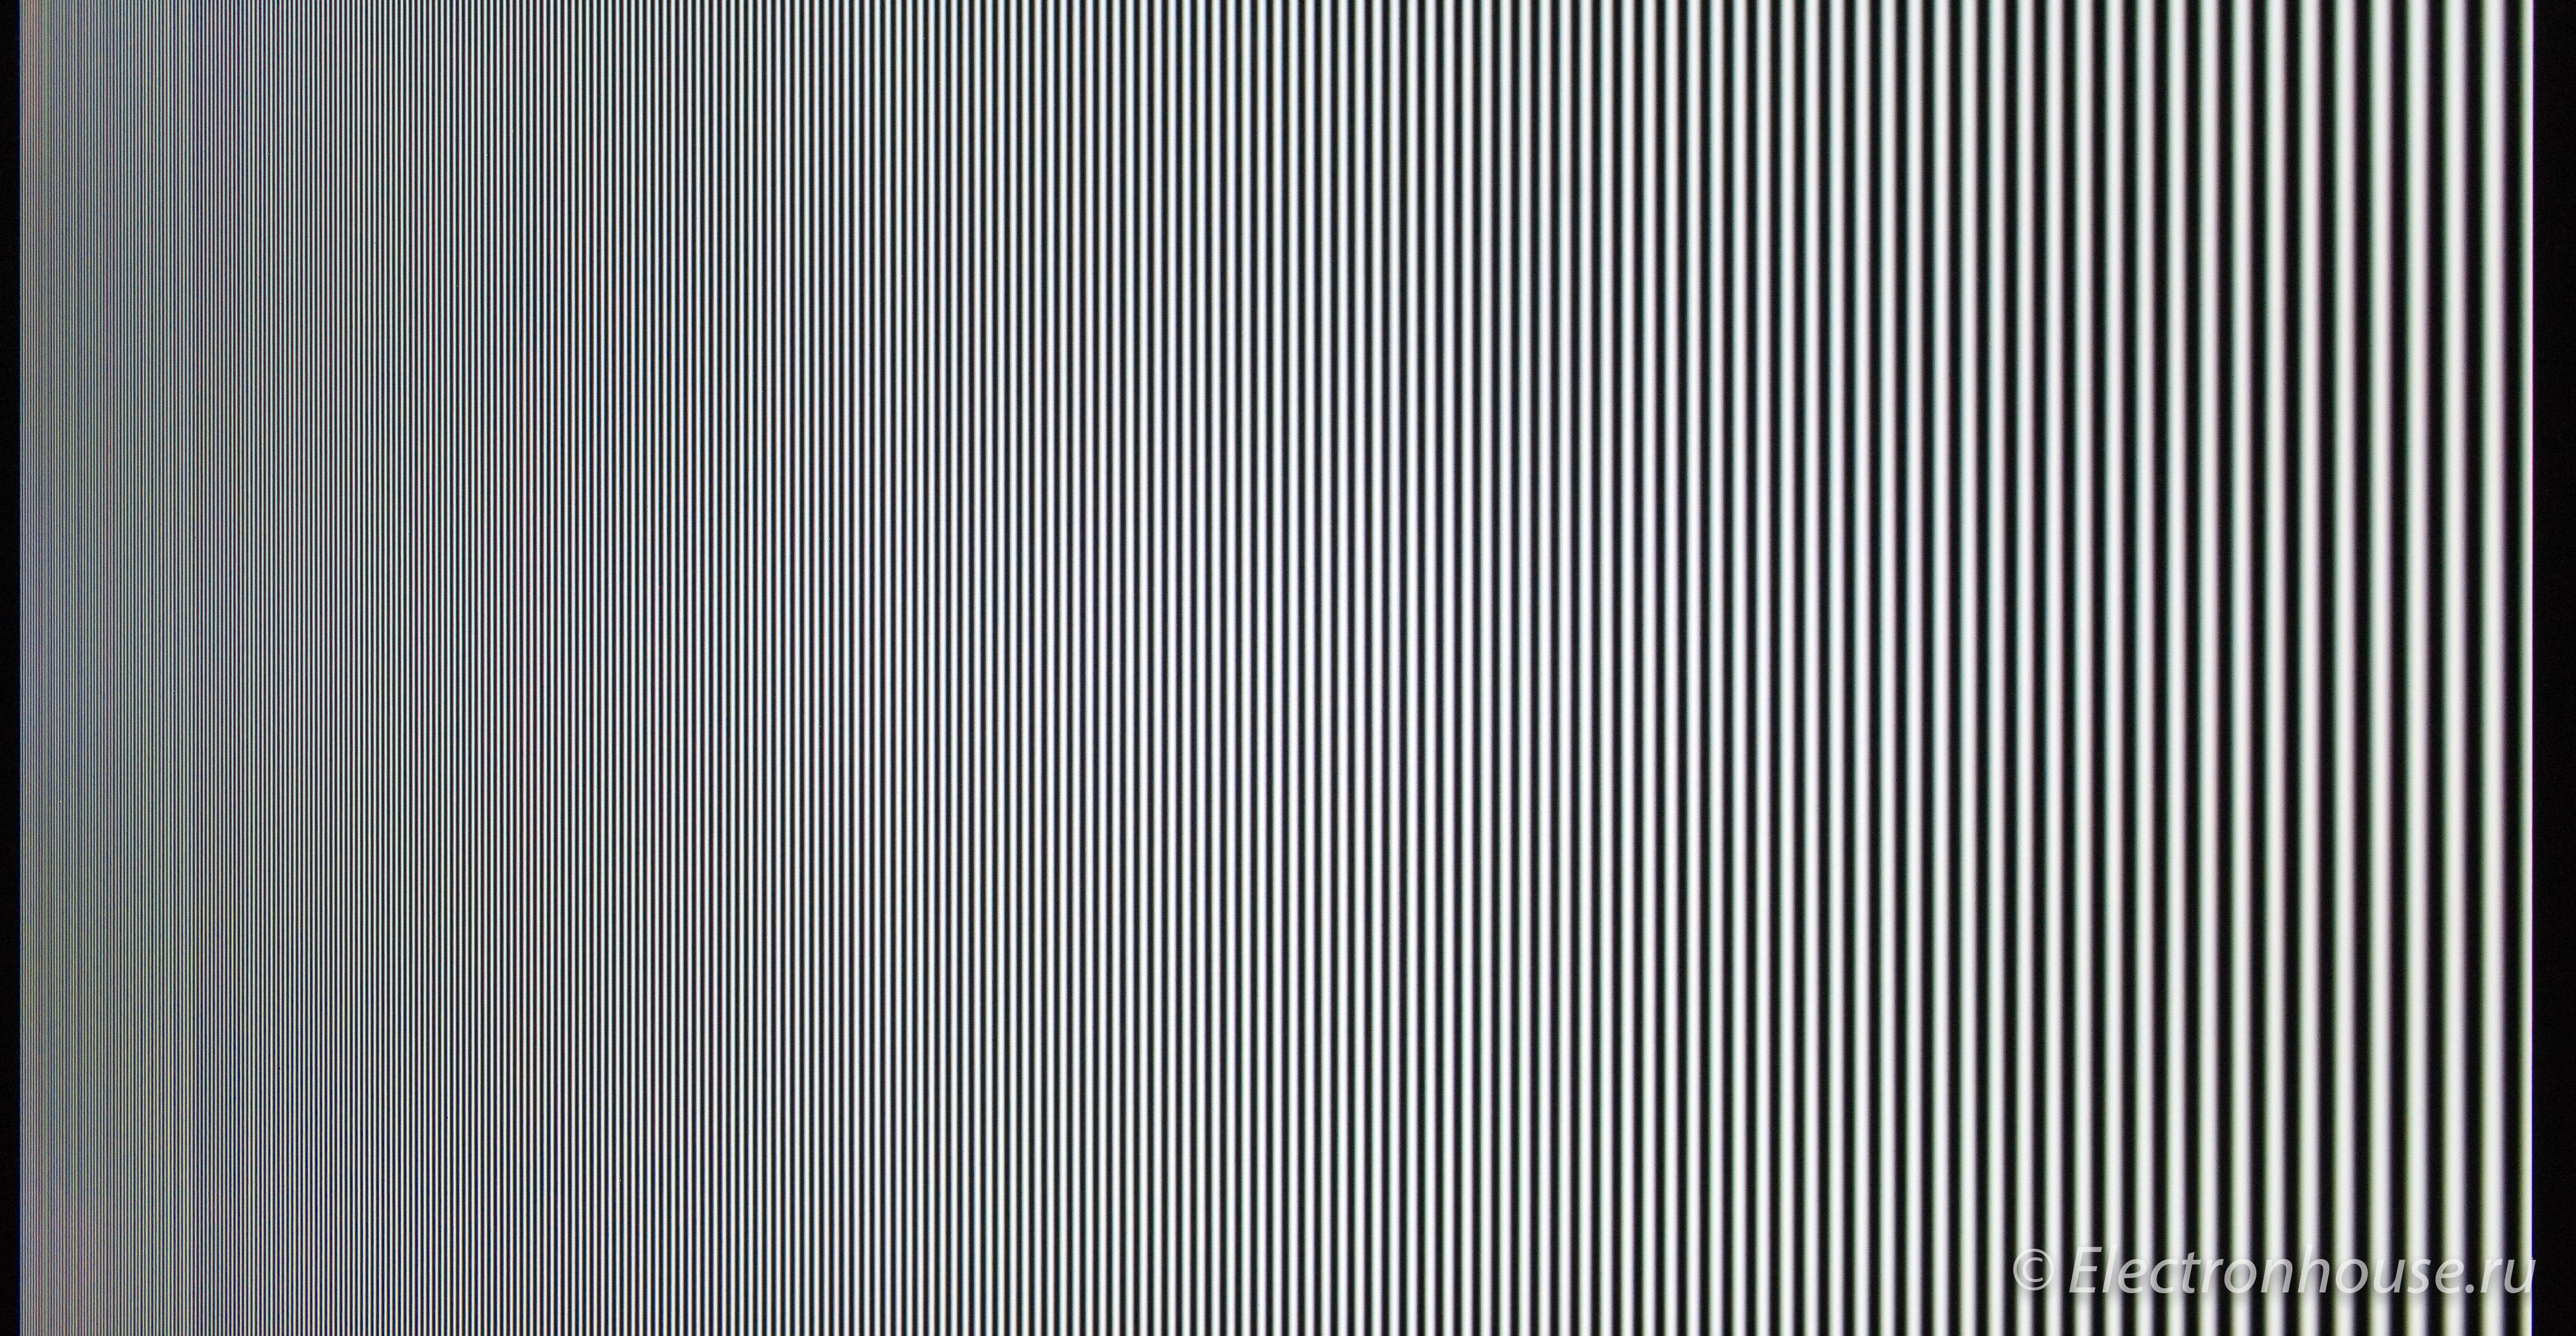 Картинки для теста матрицы телевизора